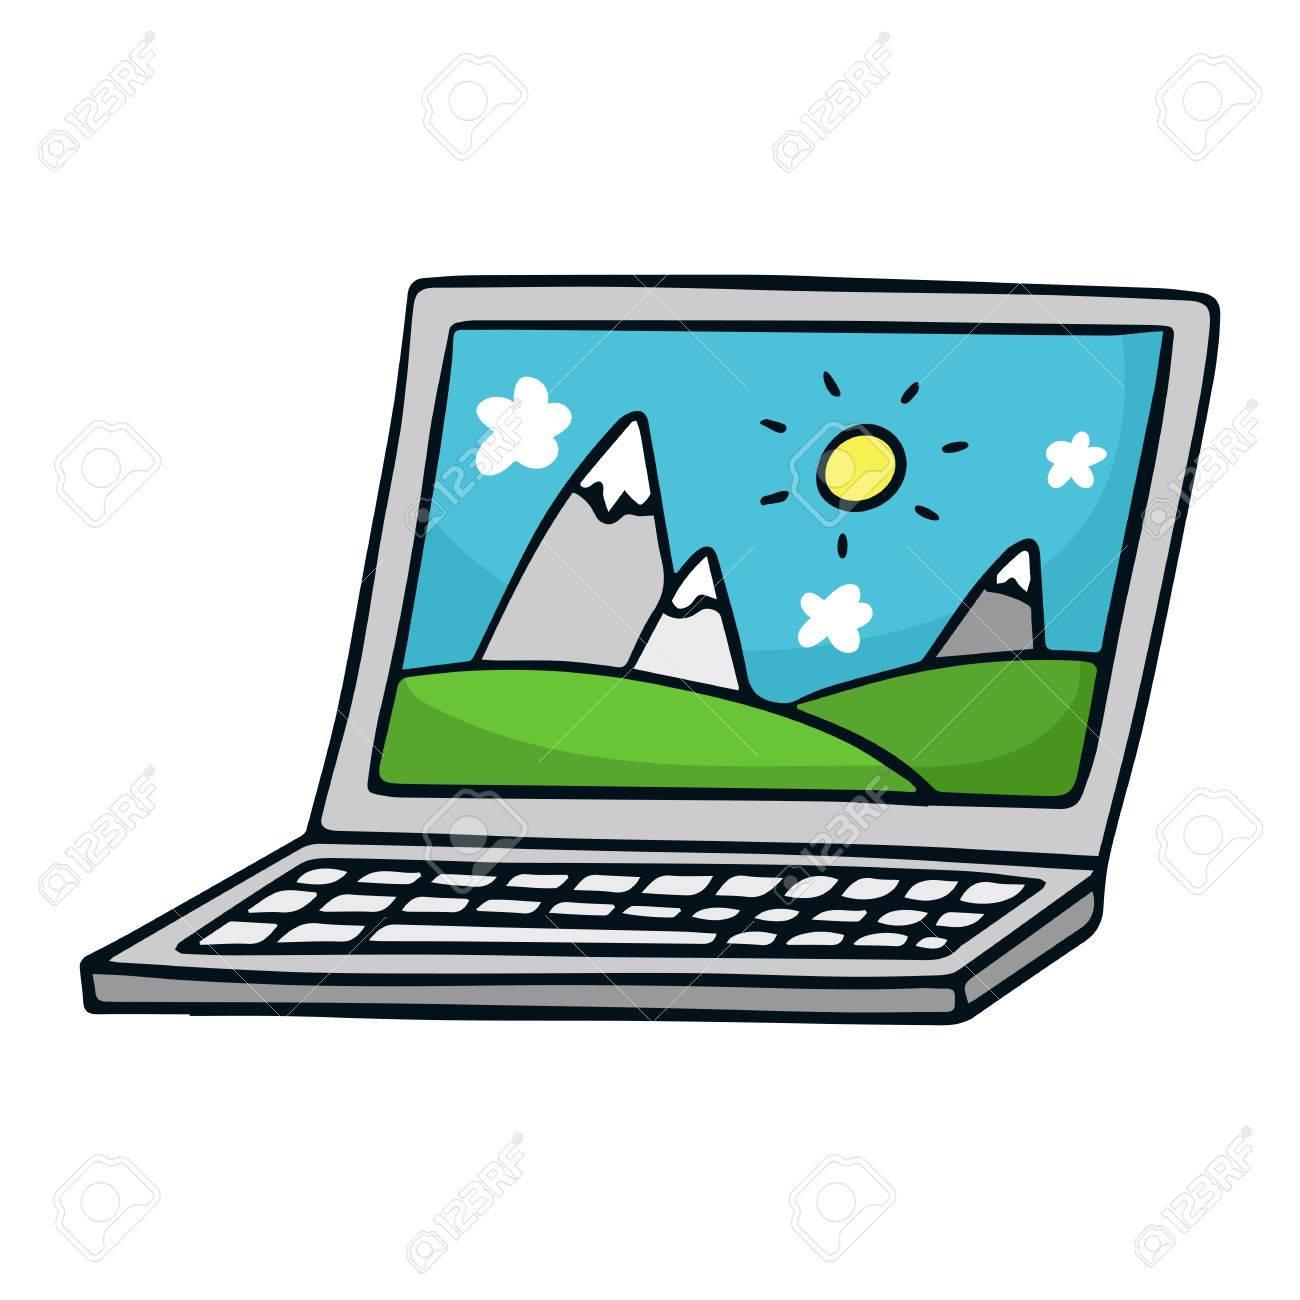 Lindo Dibujo Vectorial Dibujo De La Computadora Portátil, Aislado ...